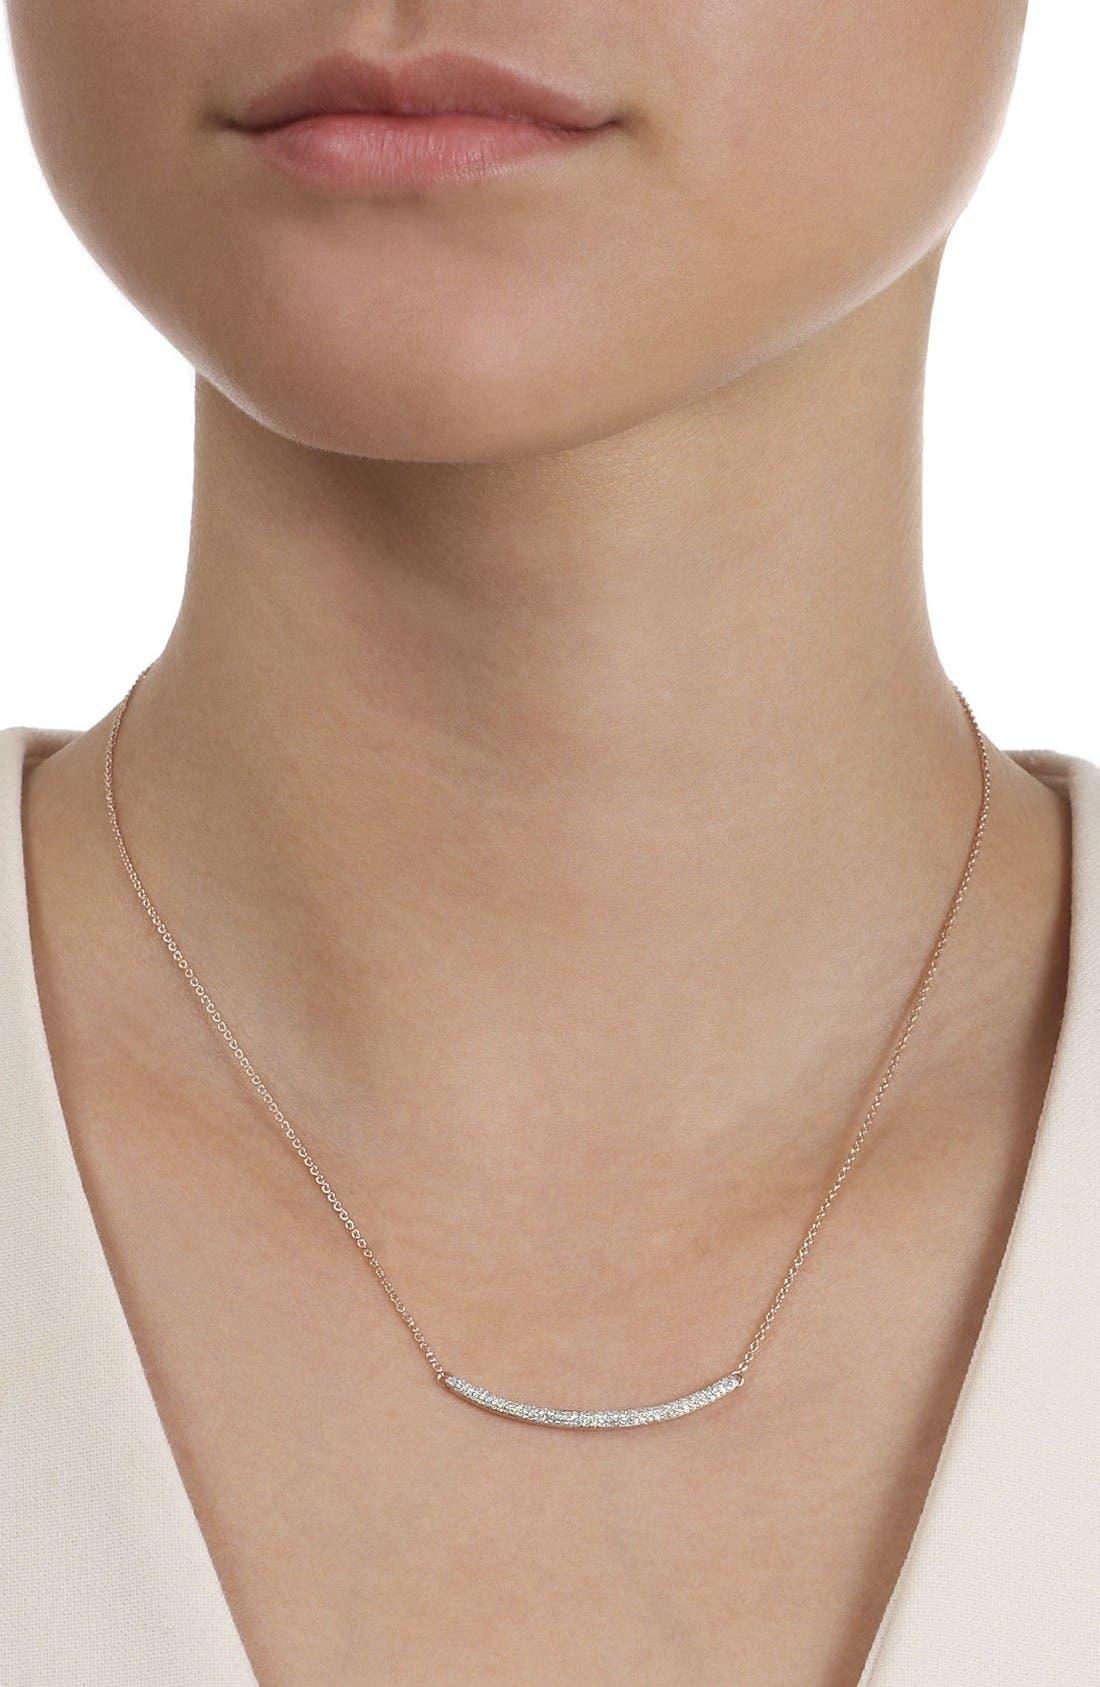 Skinny Diamond Necklace,                             Alternate thumbnail 5, color,                             Rose Gold